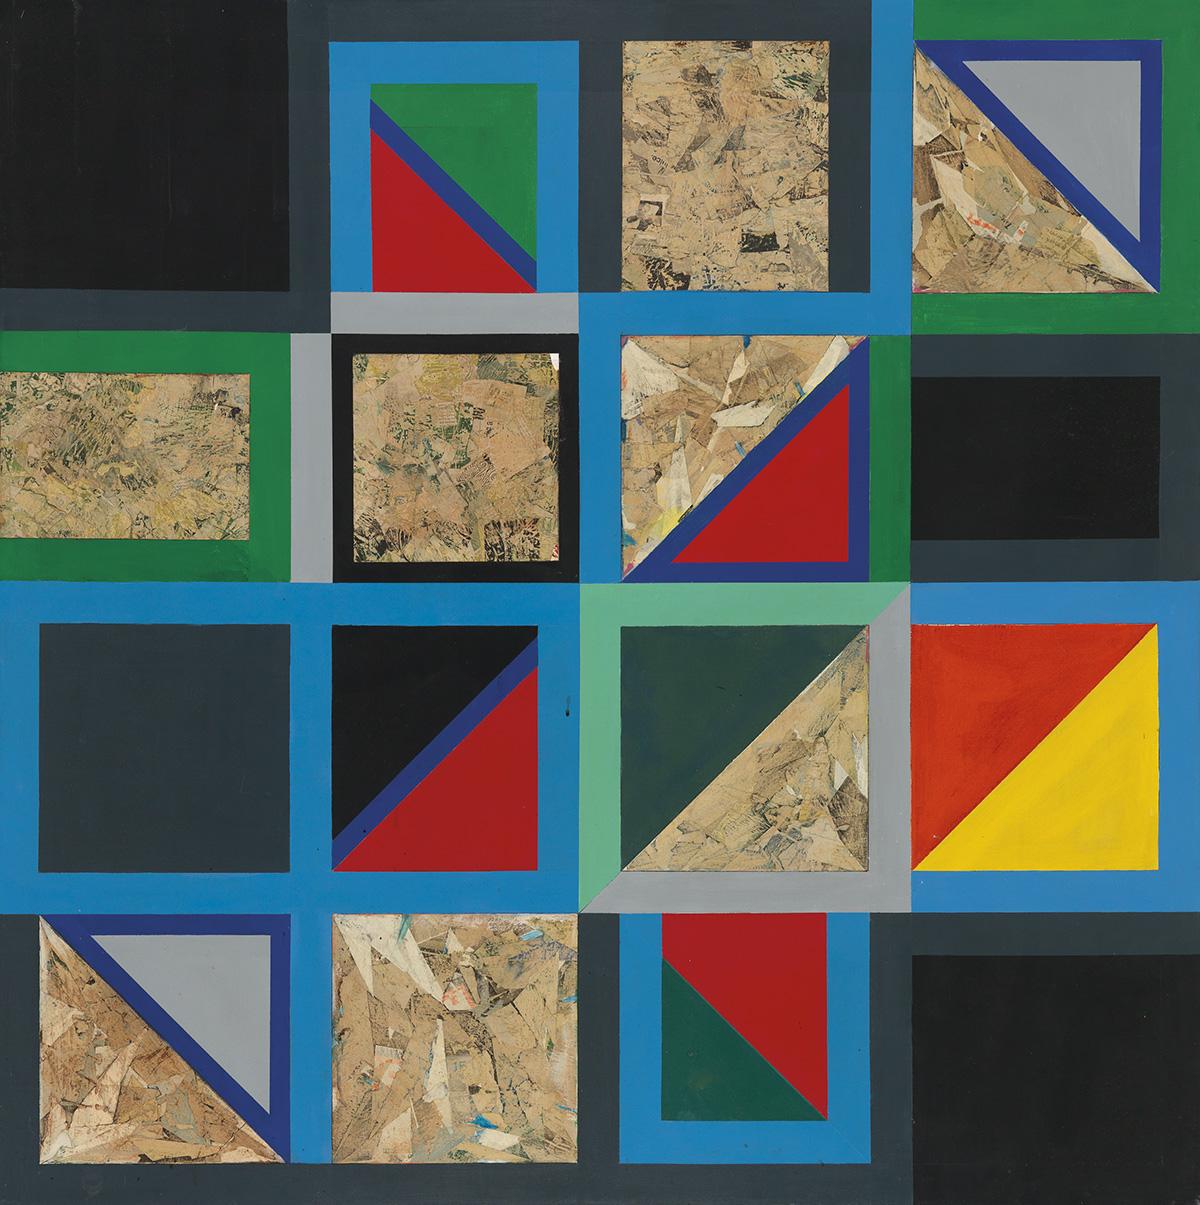 RALPH ARNOLD (1928 - 2006) Drexel Square.